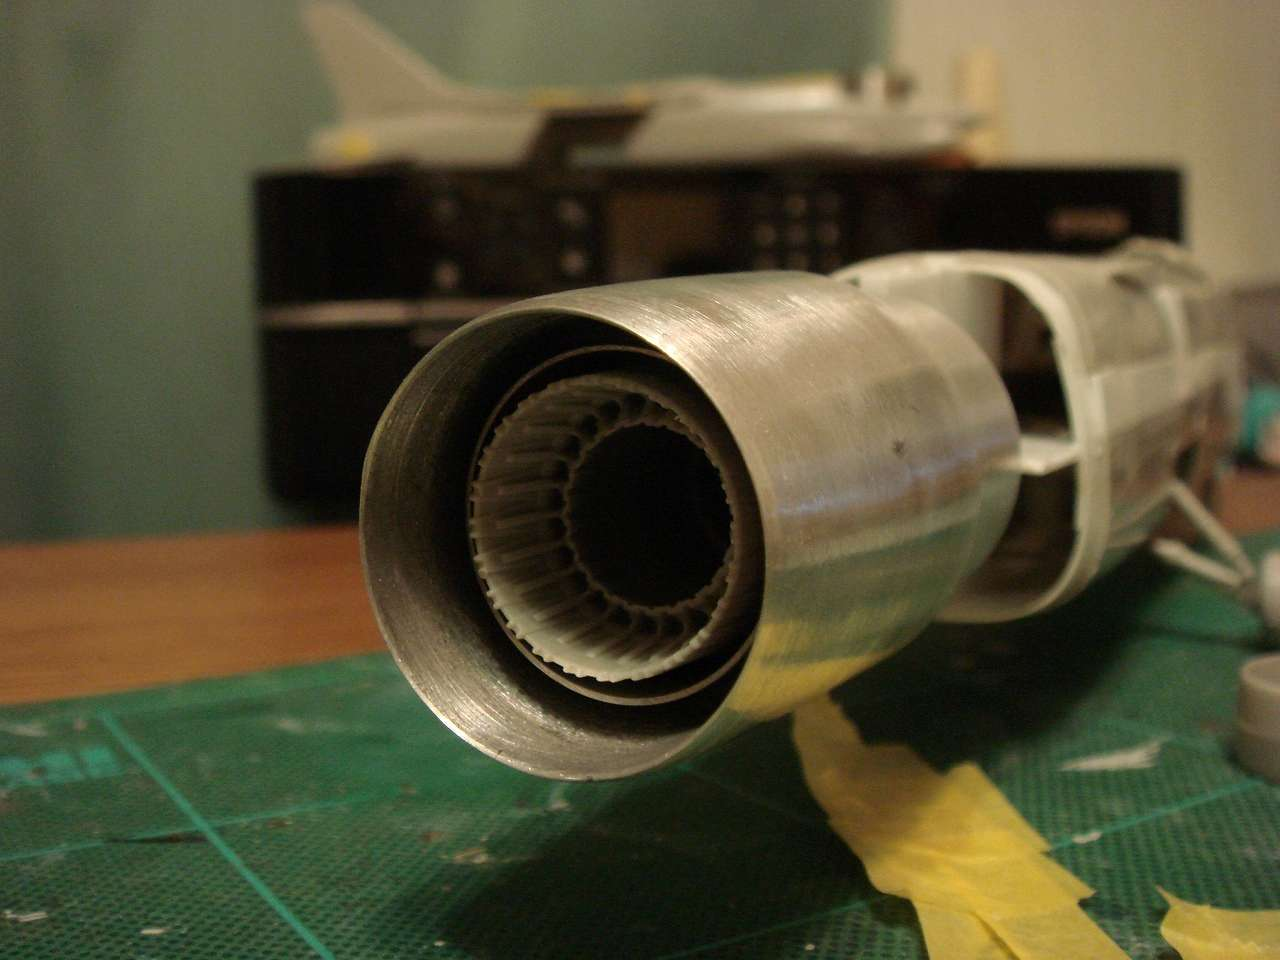 Vought XF8U-3 CRUSADER III V-401 [1/72 - Anigrand] Fullsi10